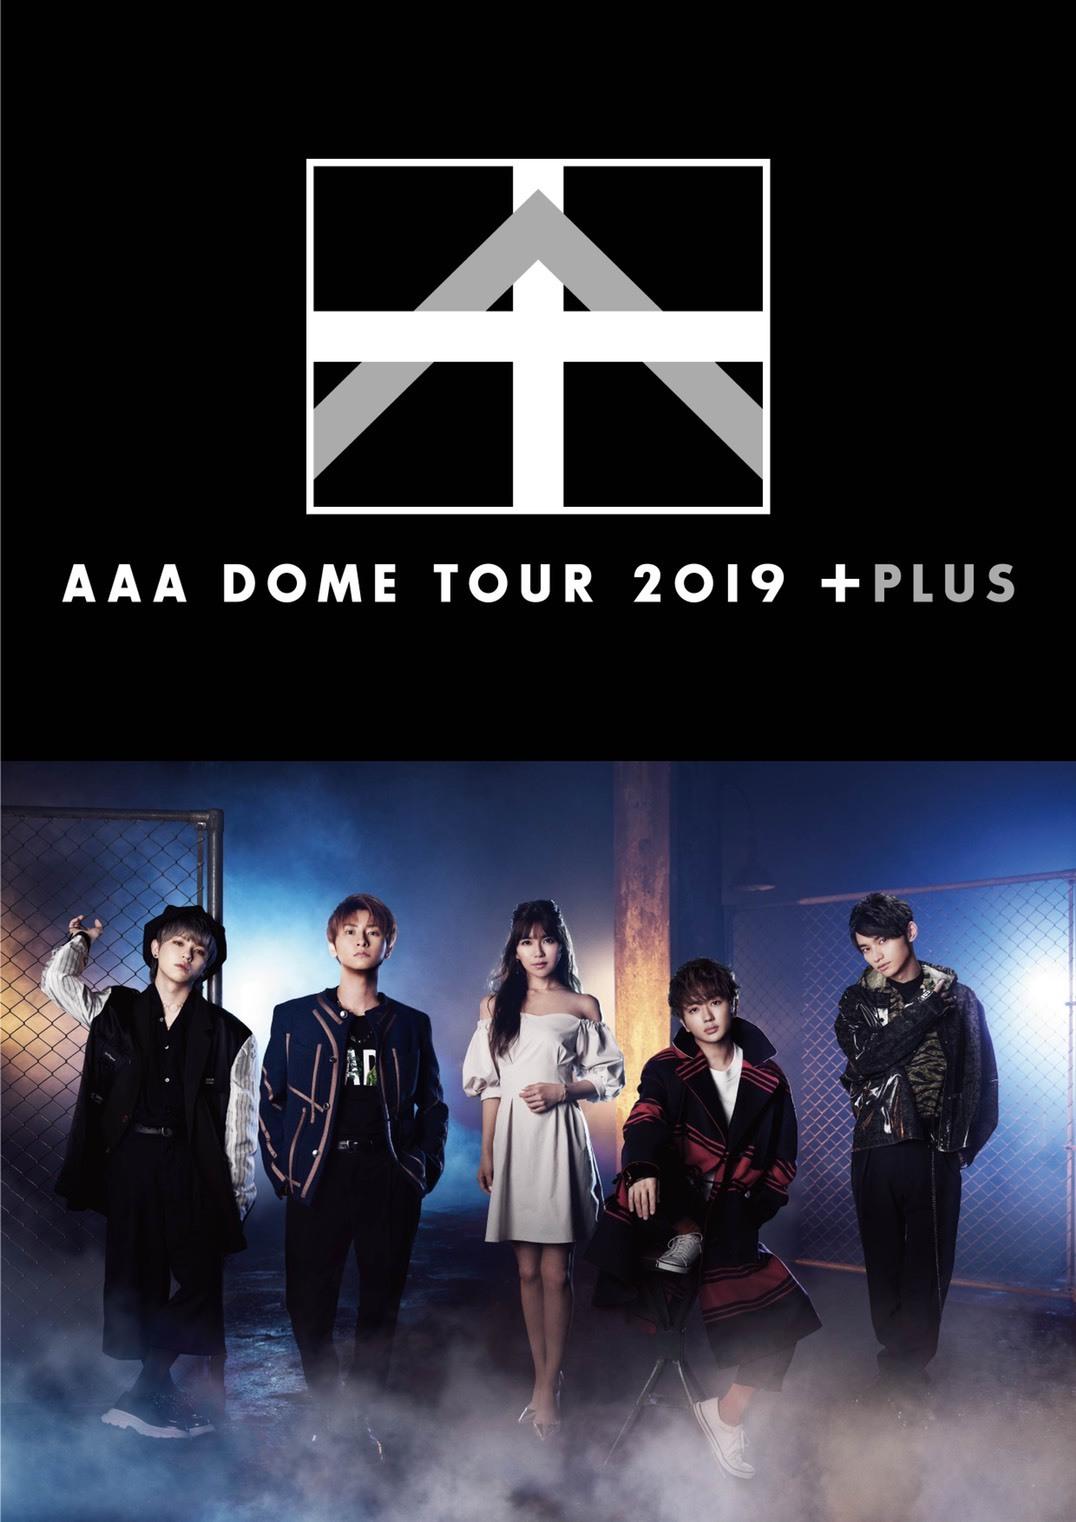 『AAA DOME TOUR 2019 +PLUS』